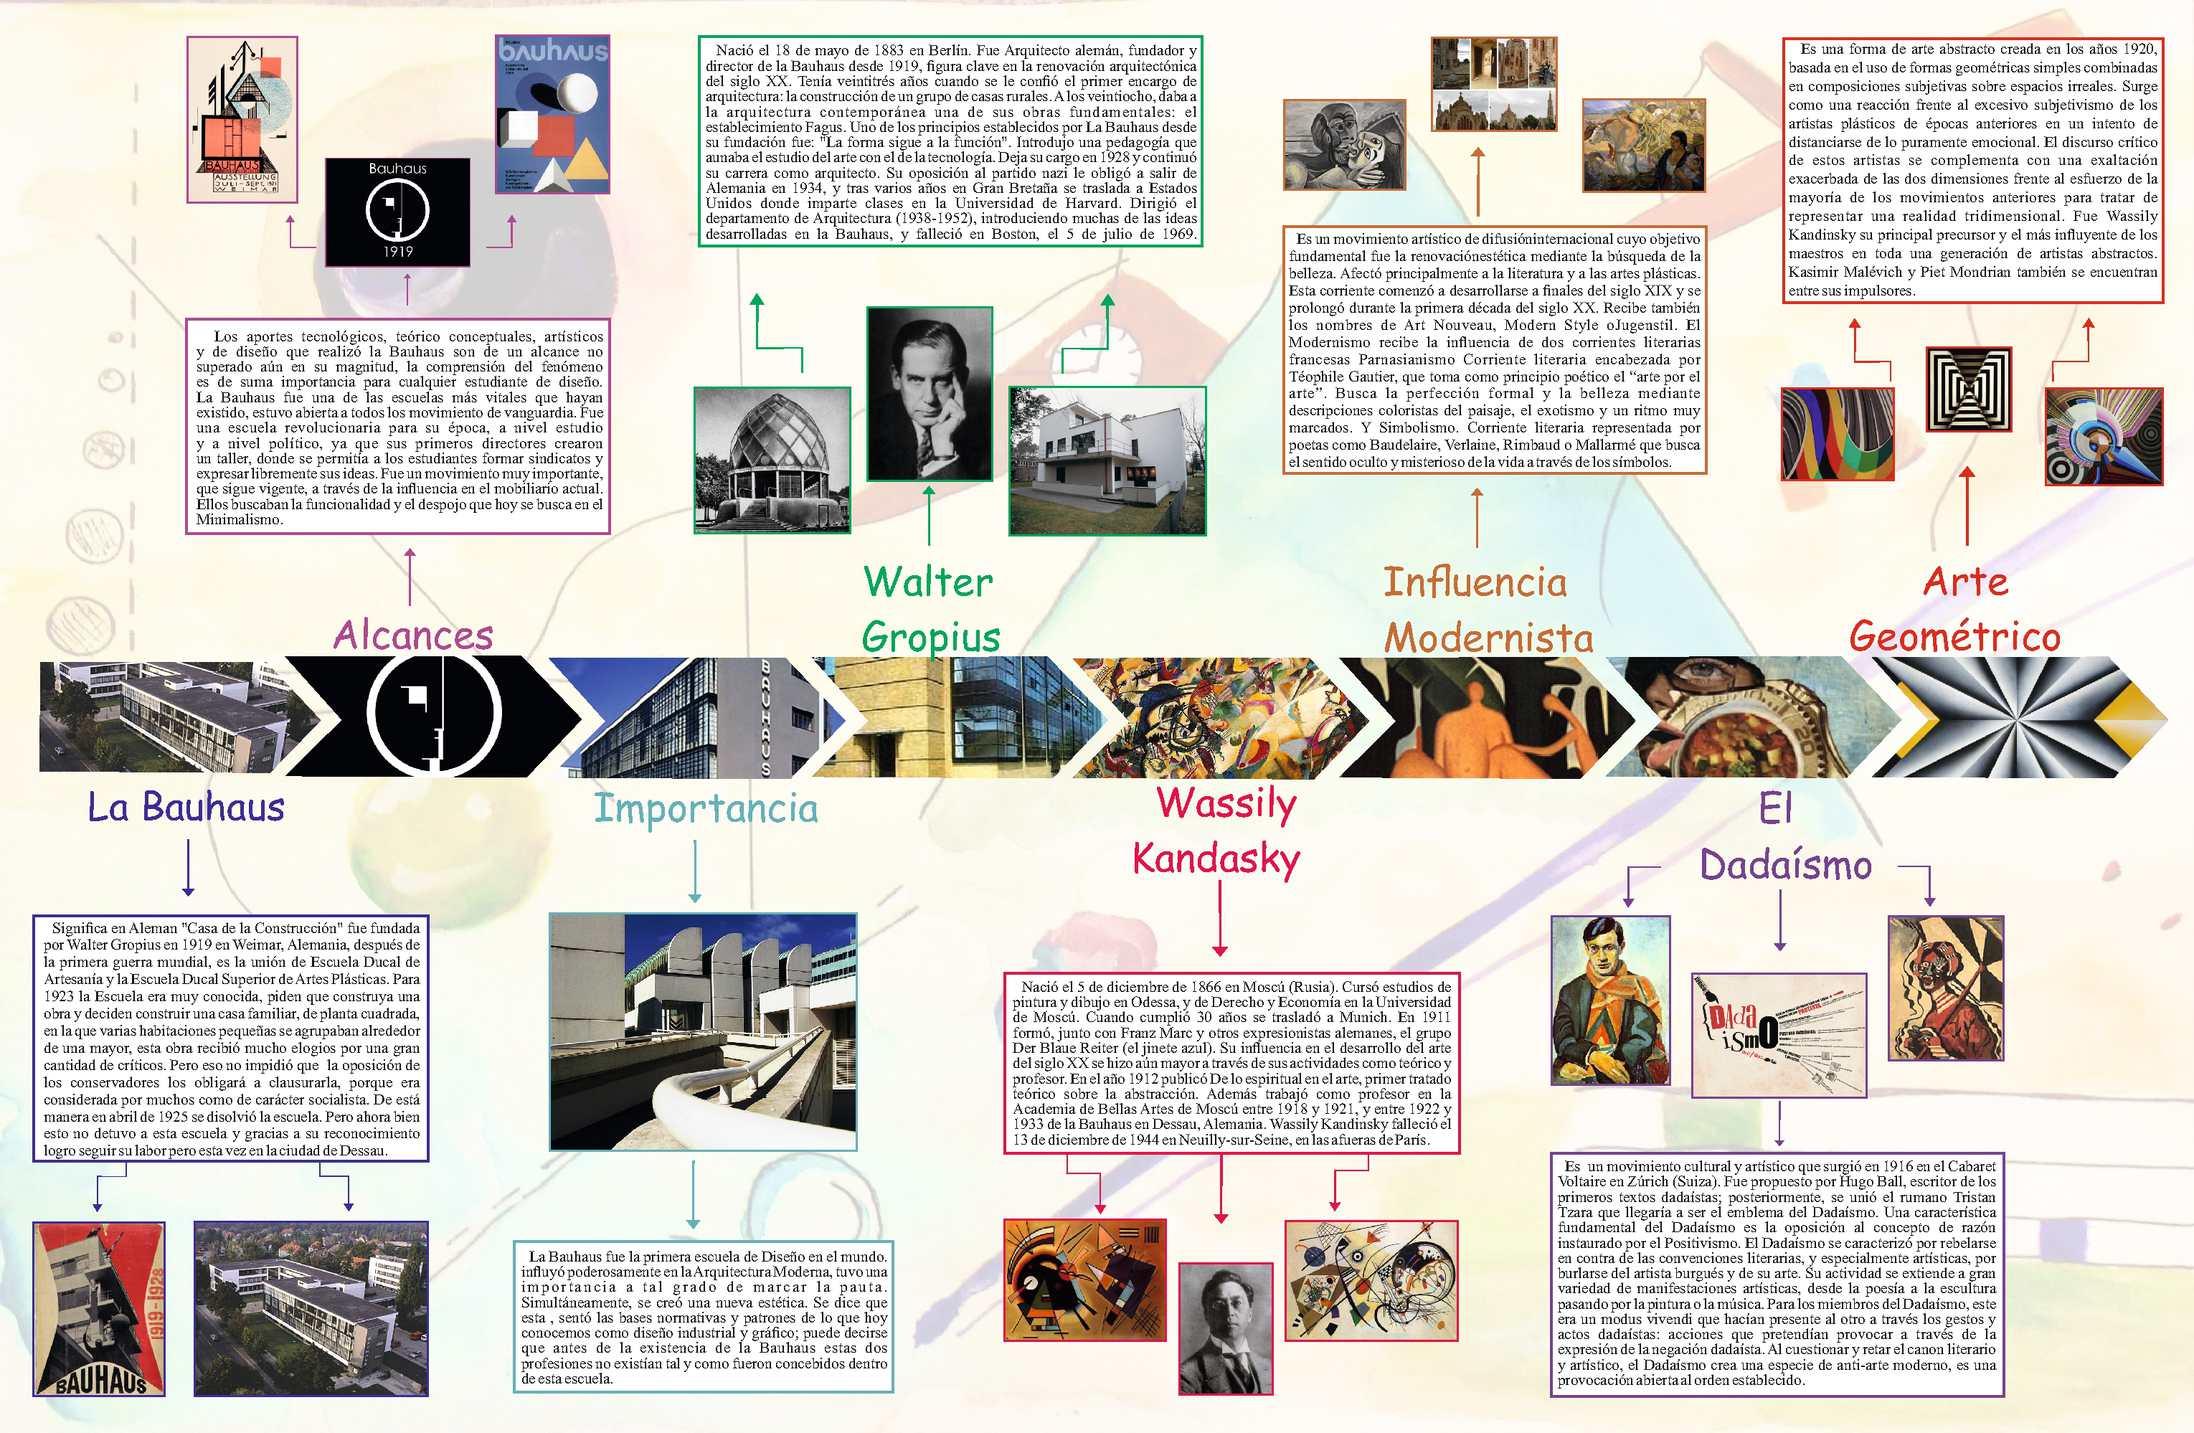 Calam o linea del tiempo for Arquitectura para la educacion pdf